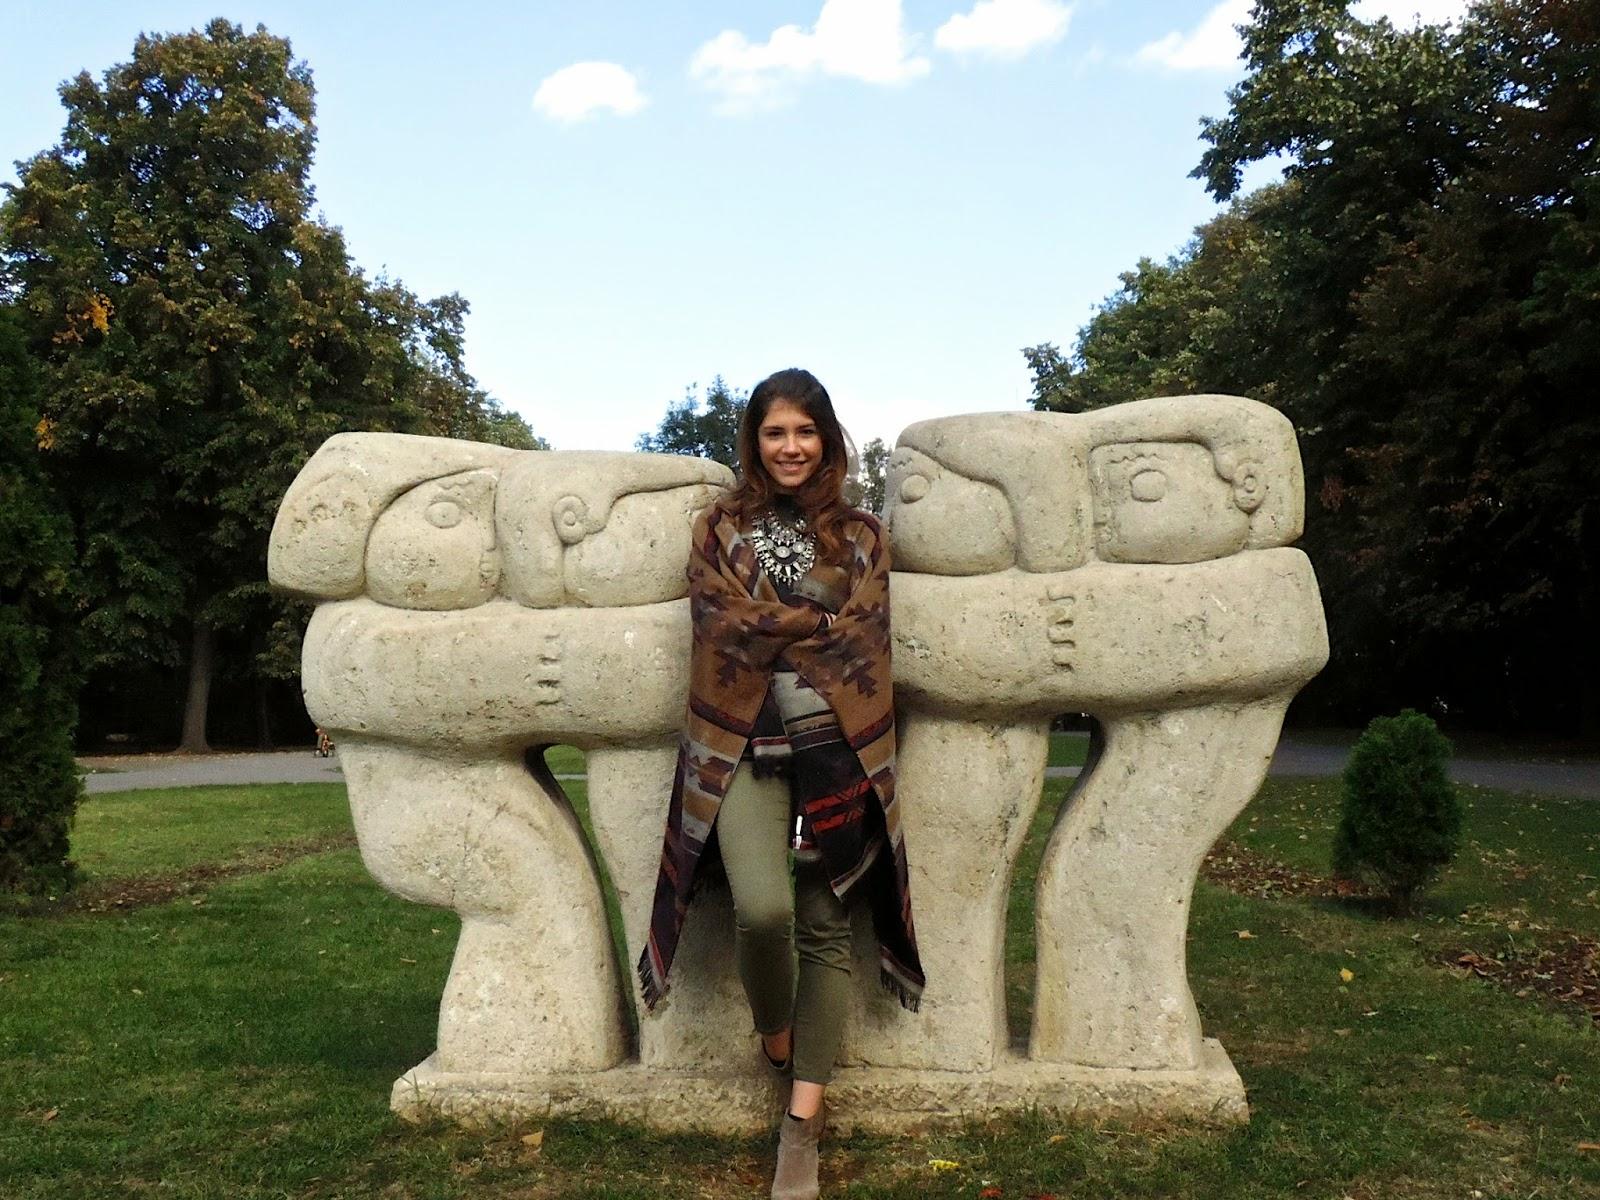 Autumn fashion with Brancusi style romanian statue